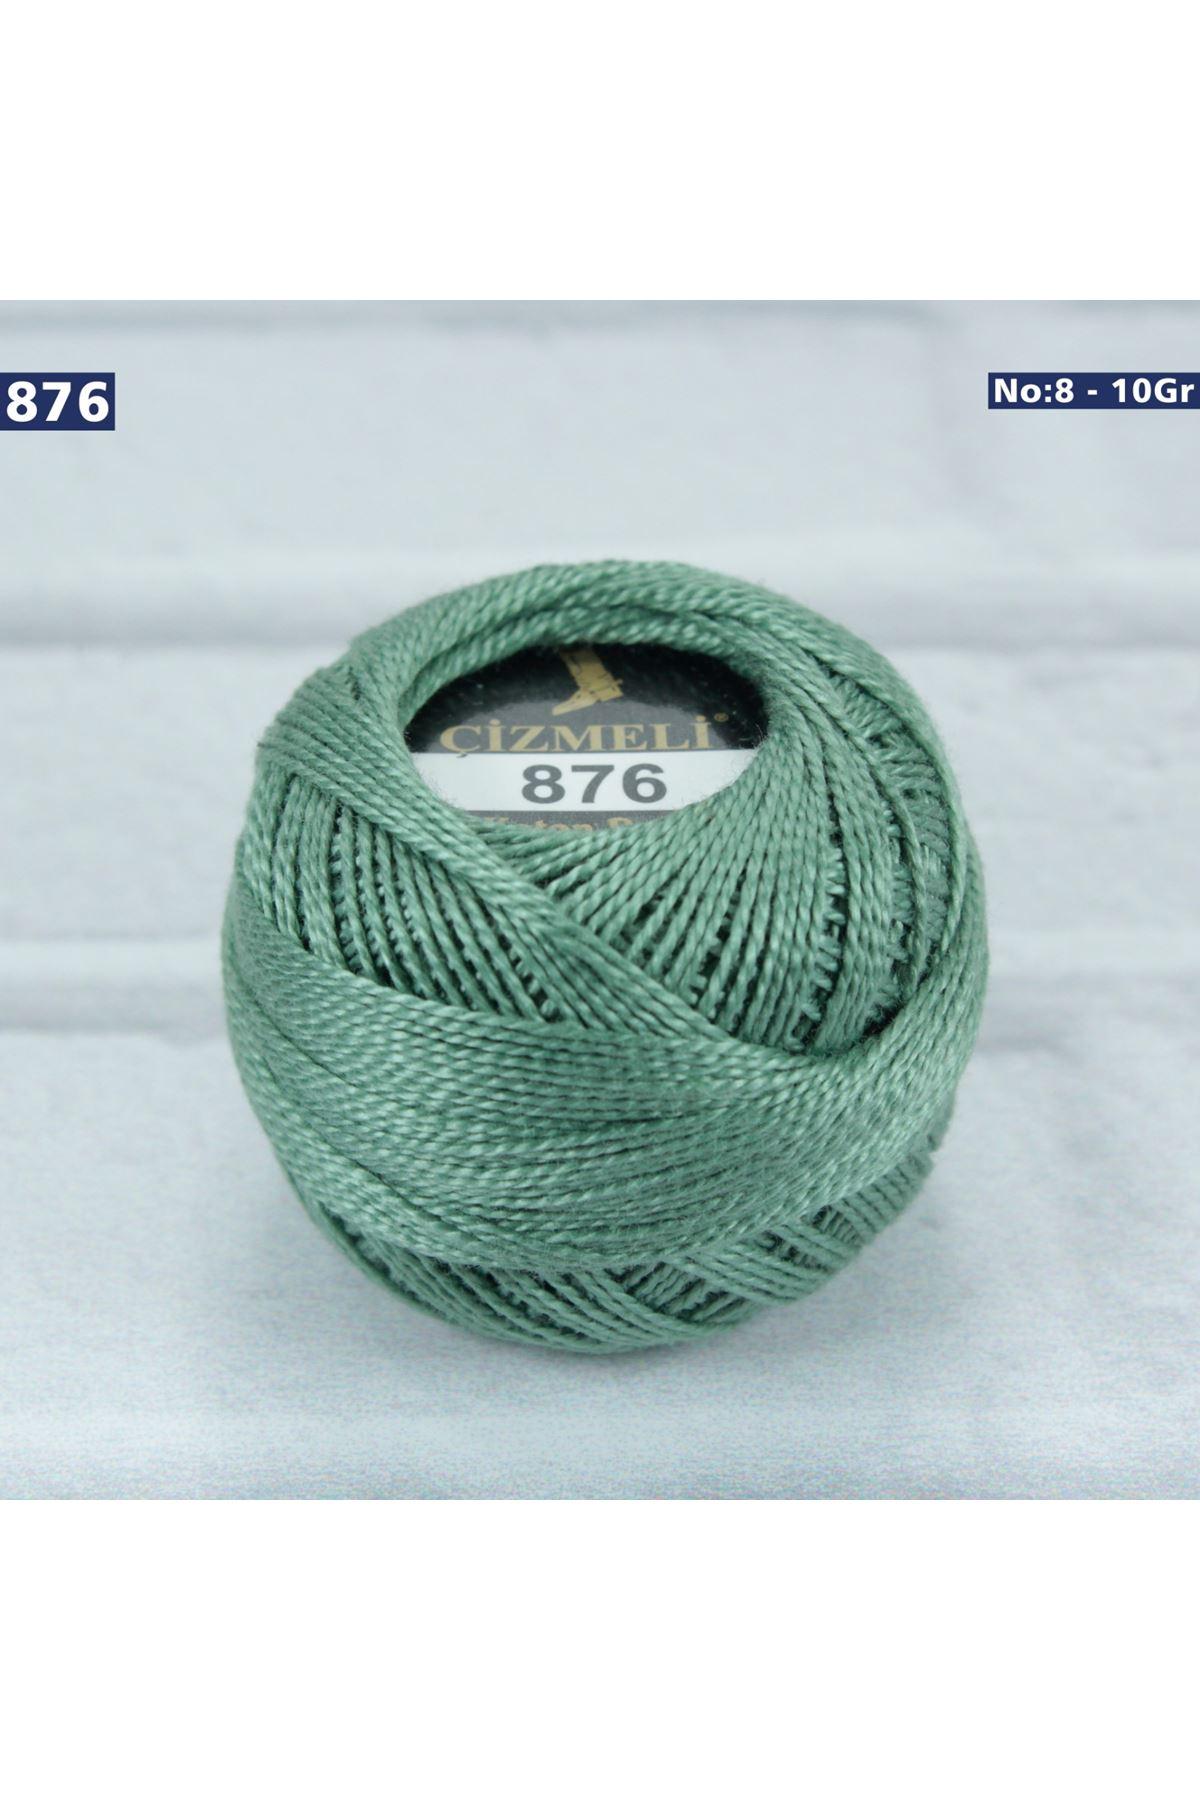 Çizmeli Cotton Perle Nakış İpliği No: 876